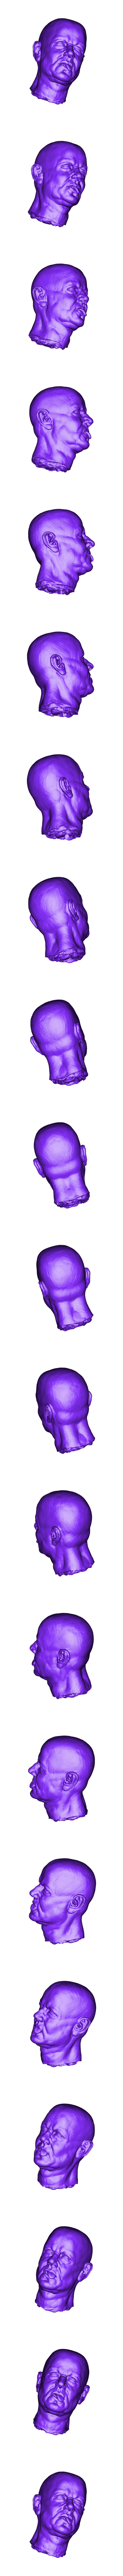 Head (repaired).stl Download free STL file Black hunter • 3D printer template, al3x